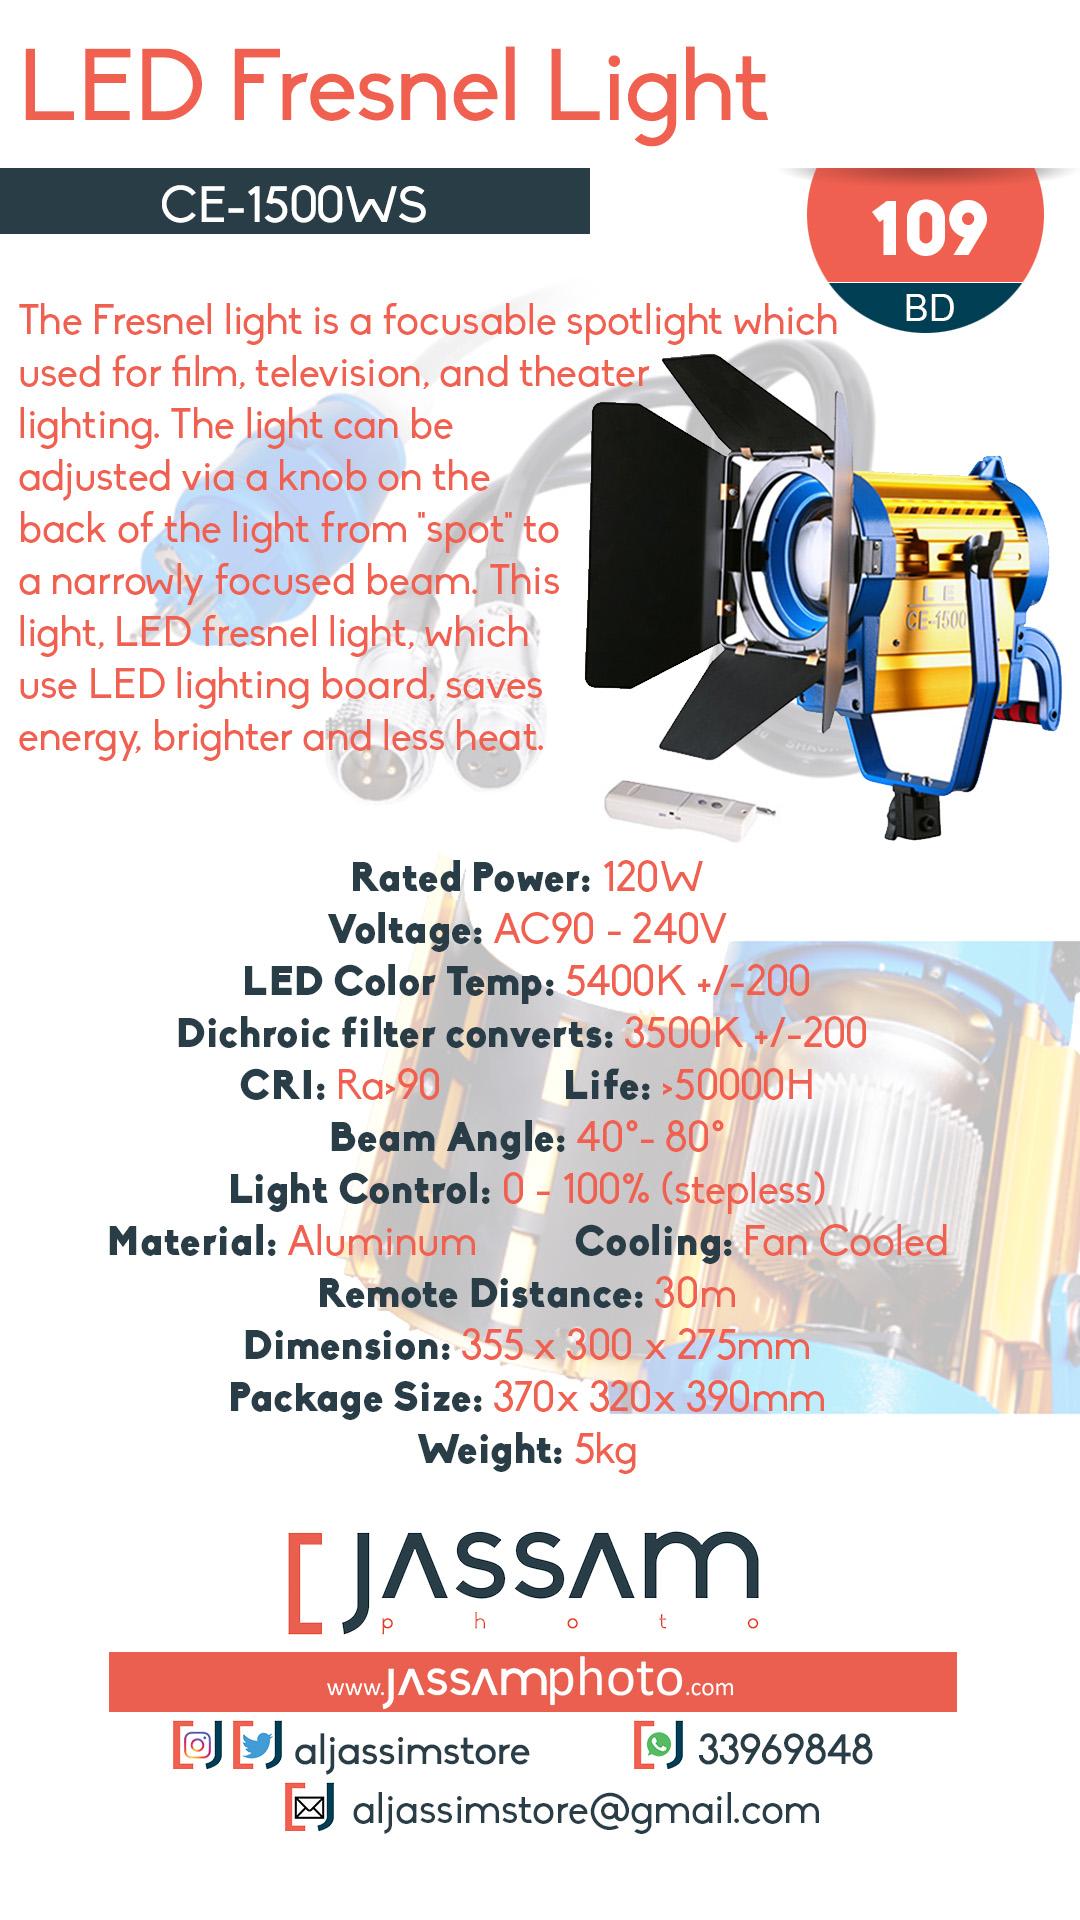 LED Fresnel CE-1500WS